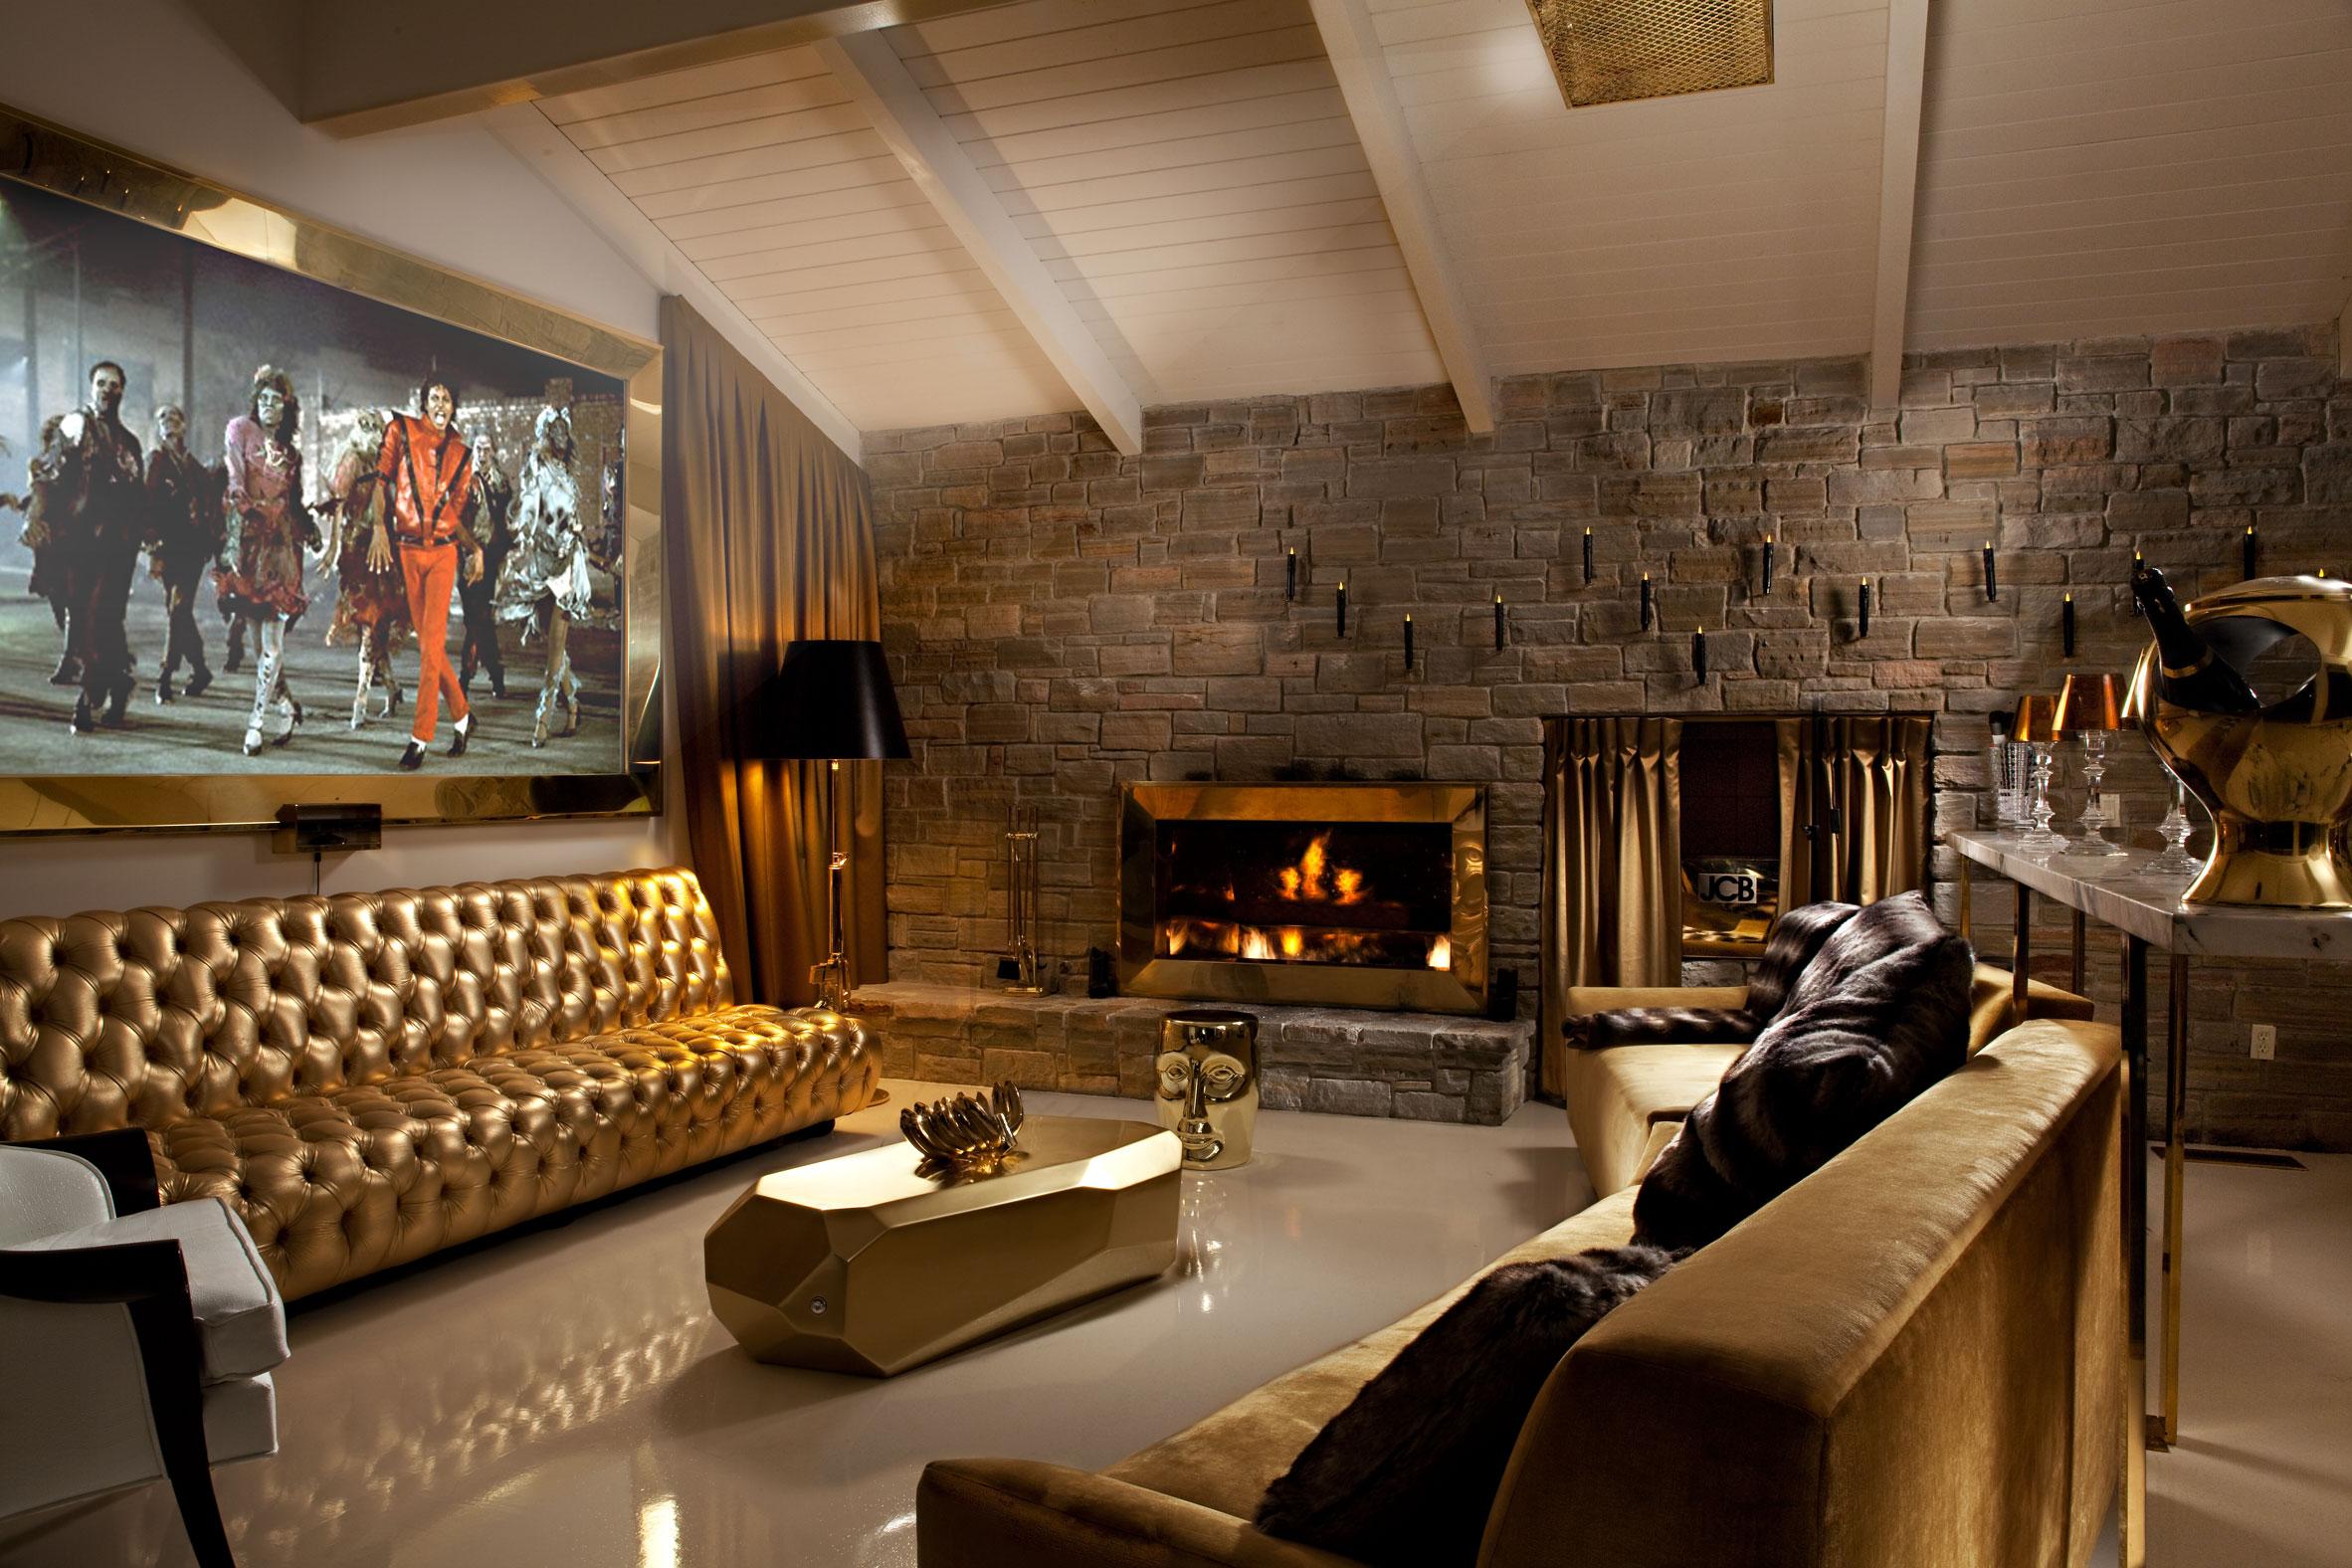 joshua rowland interiors